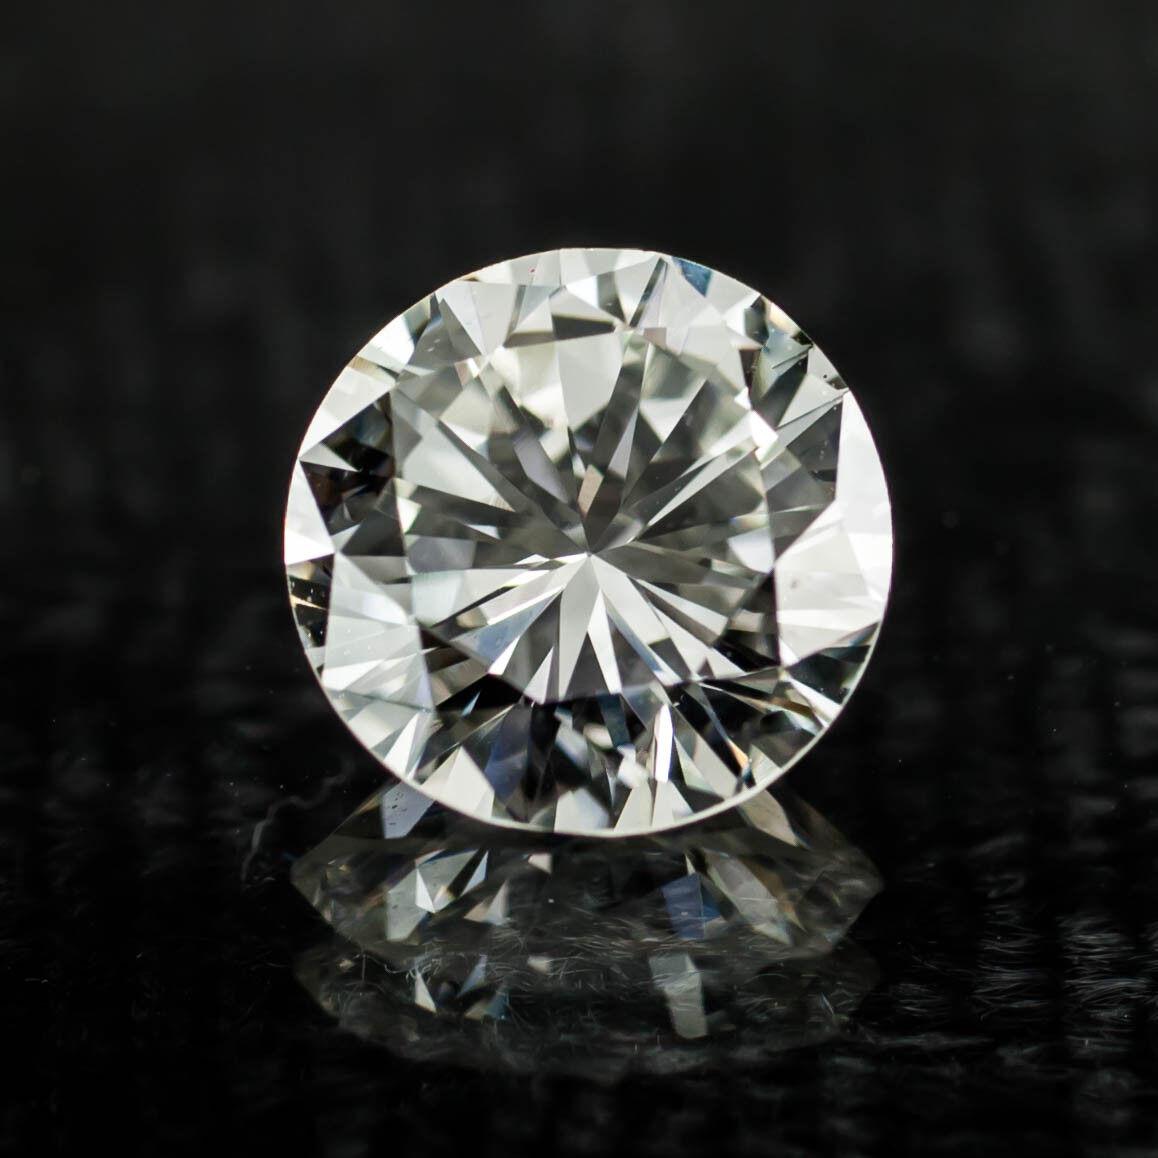 1.66 Carat Loose H / VS2 Round Brilliant Cut Diamond GIA Certified